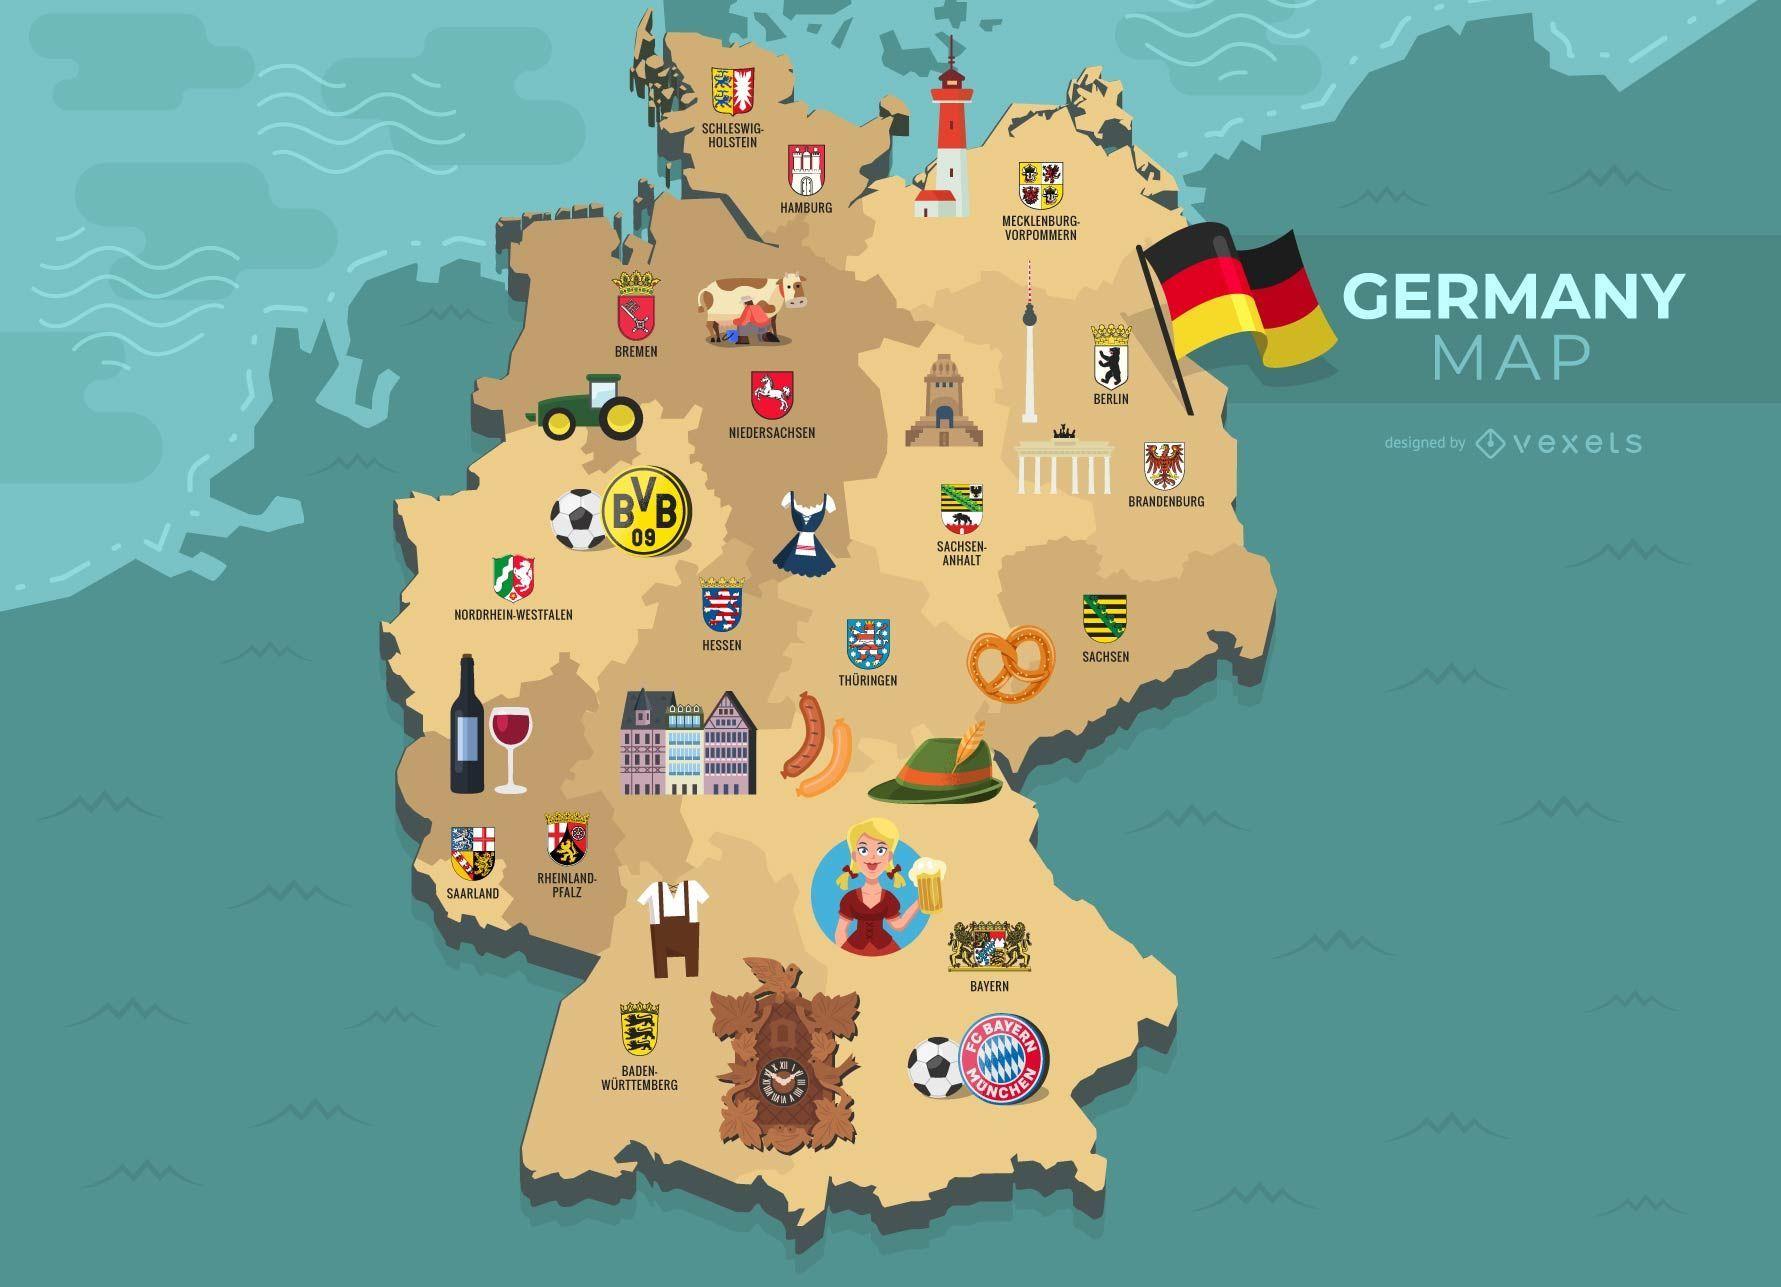 Germany Map Illustration